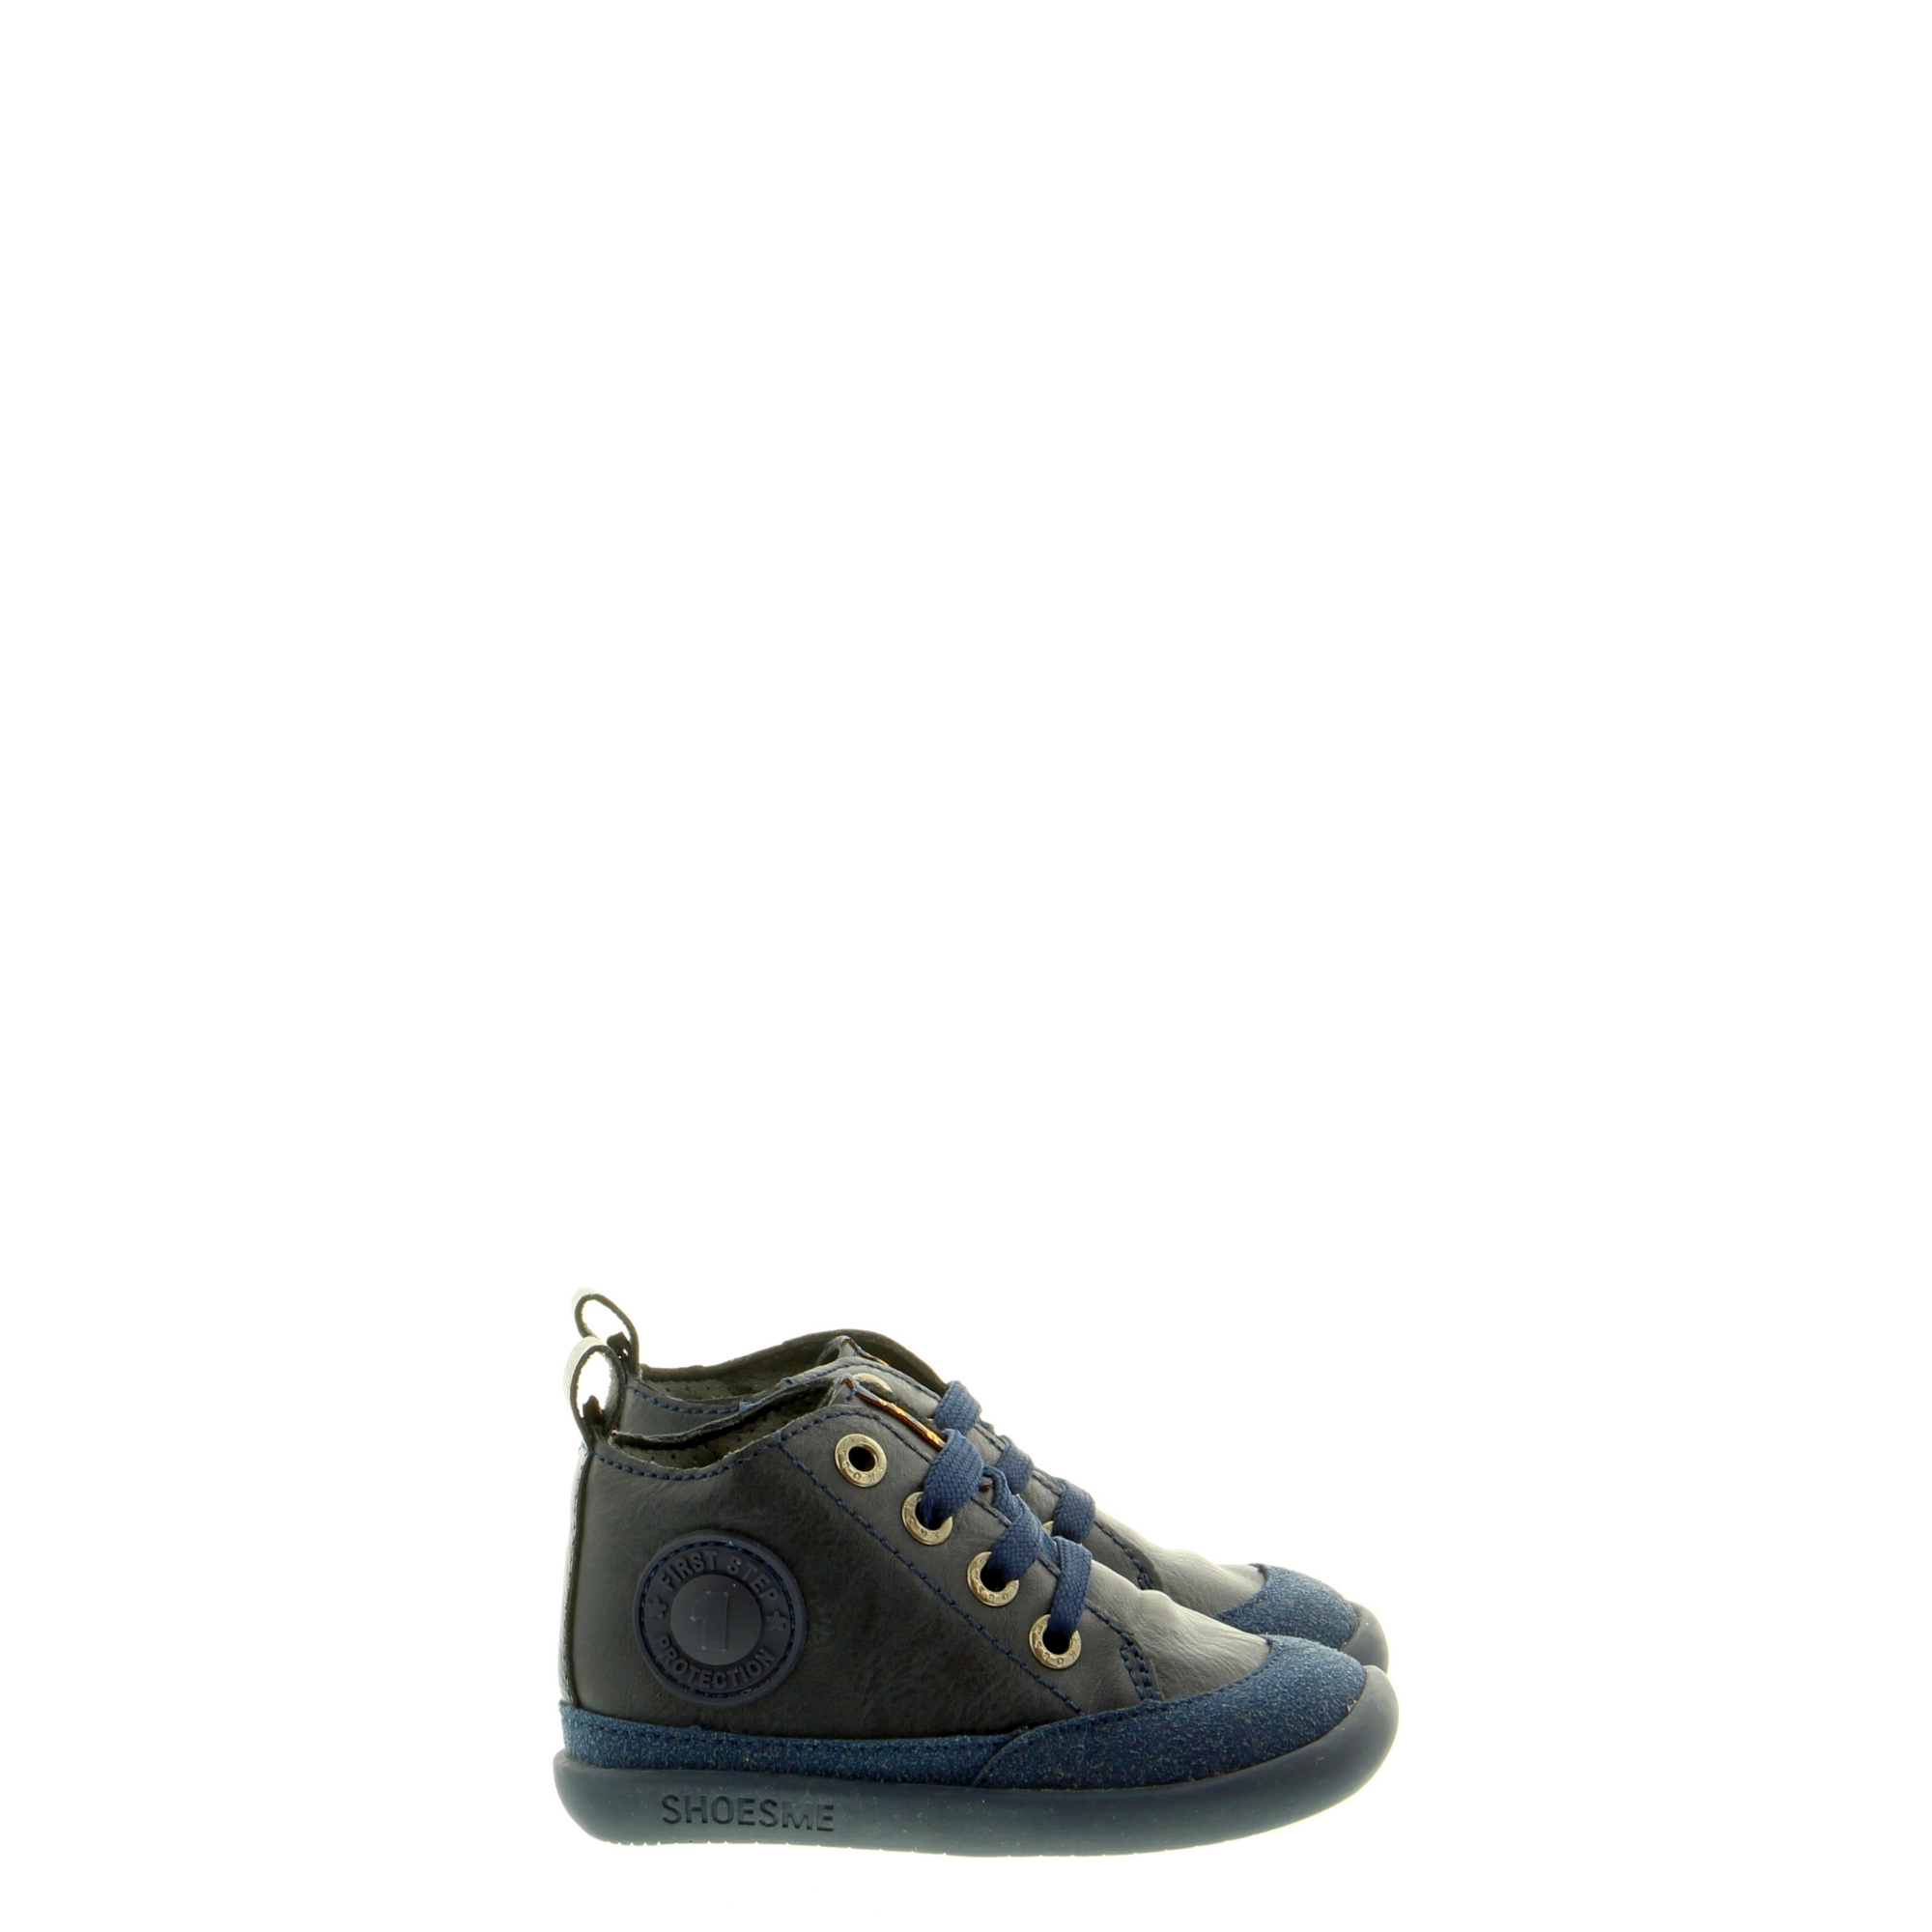 ShoesMe BF8W001-A Marino